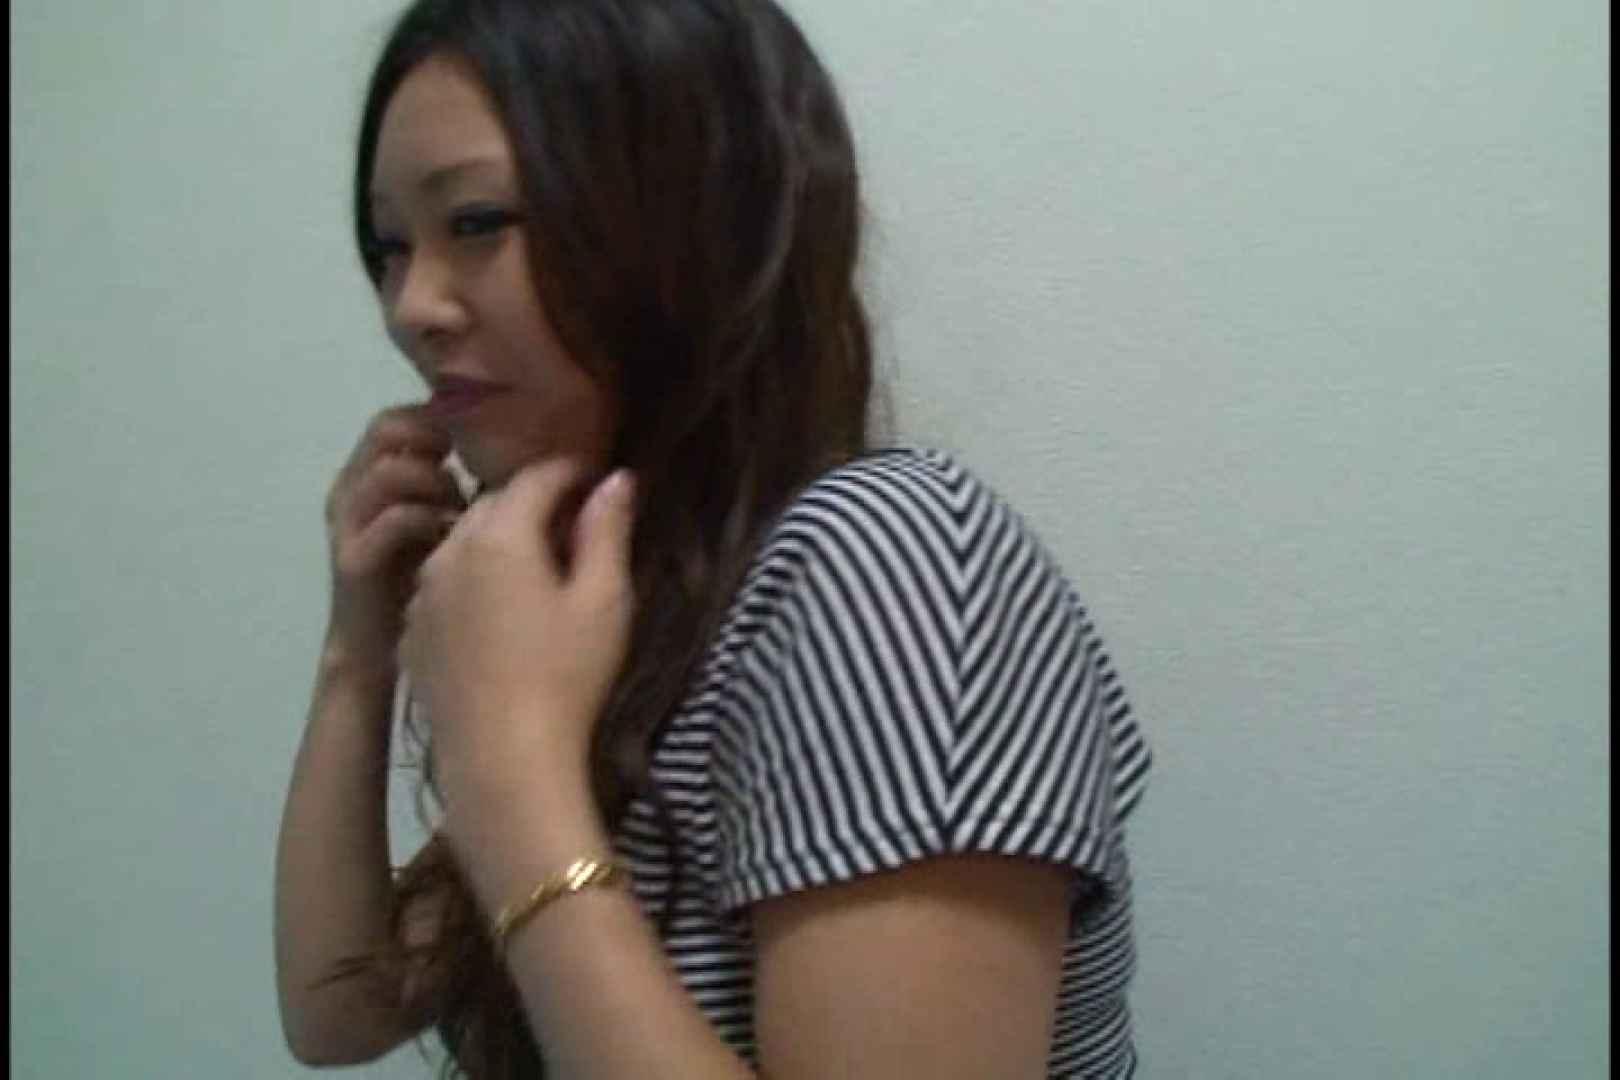 JDハンター全国ツアー vol.040 前編 女子大生のエロ動画 | 0  101PIX 47